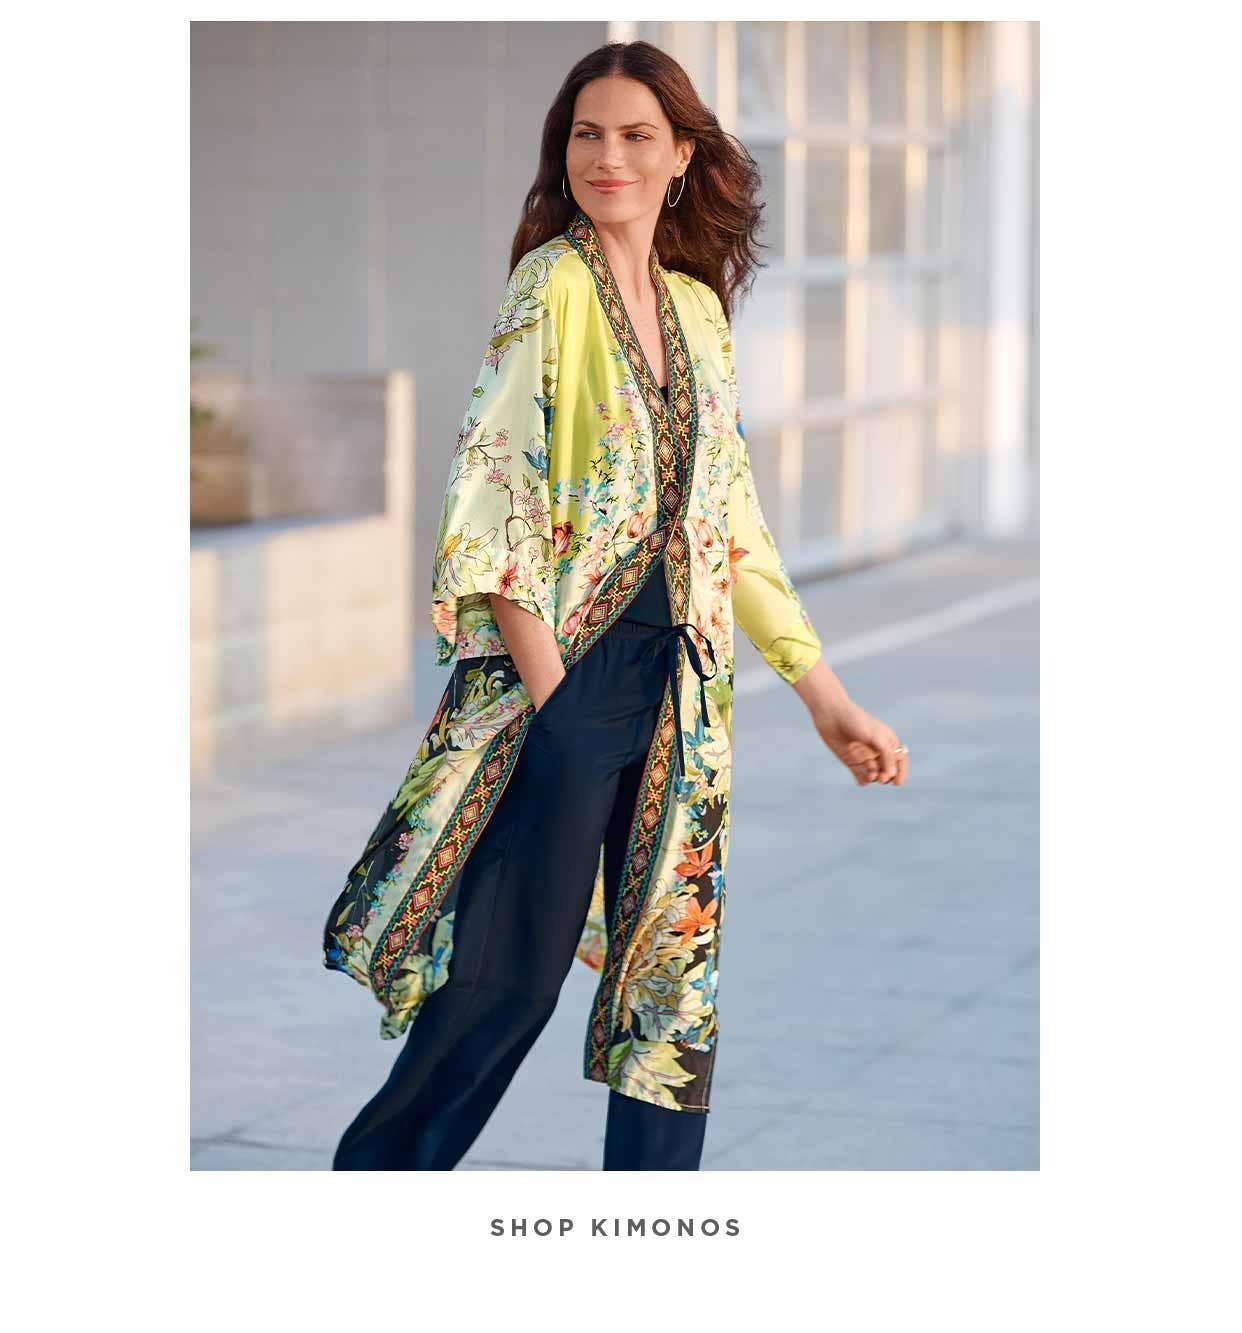 Shop Kimonos